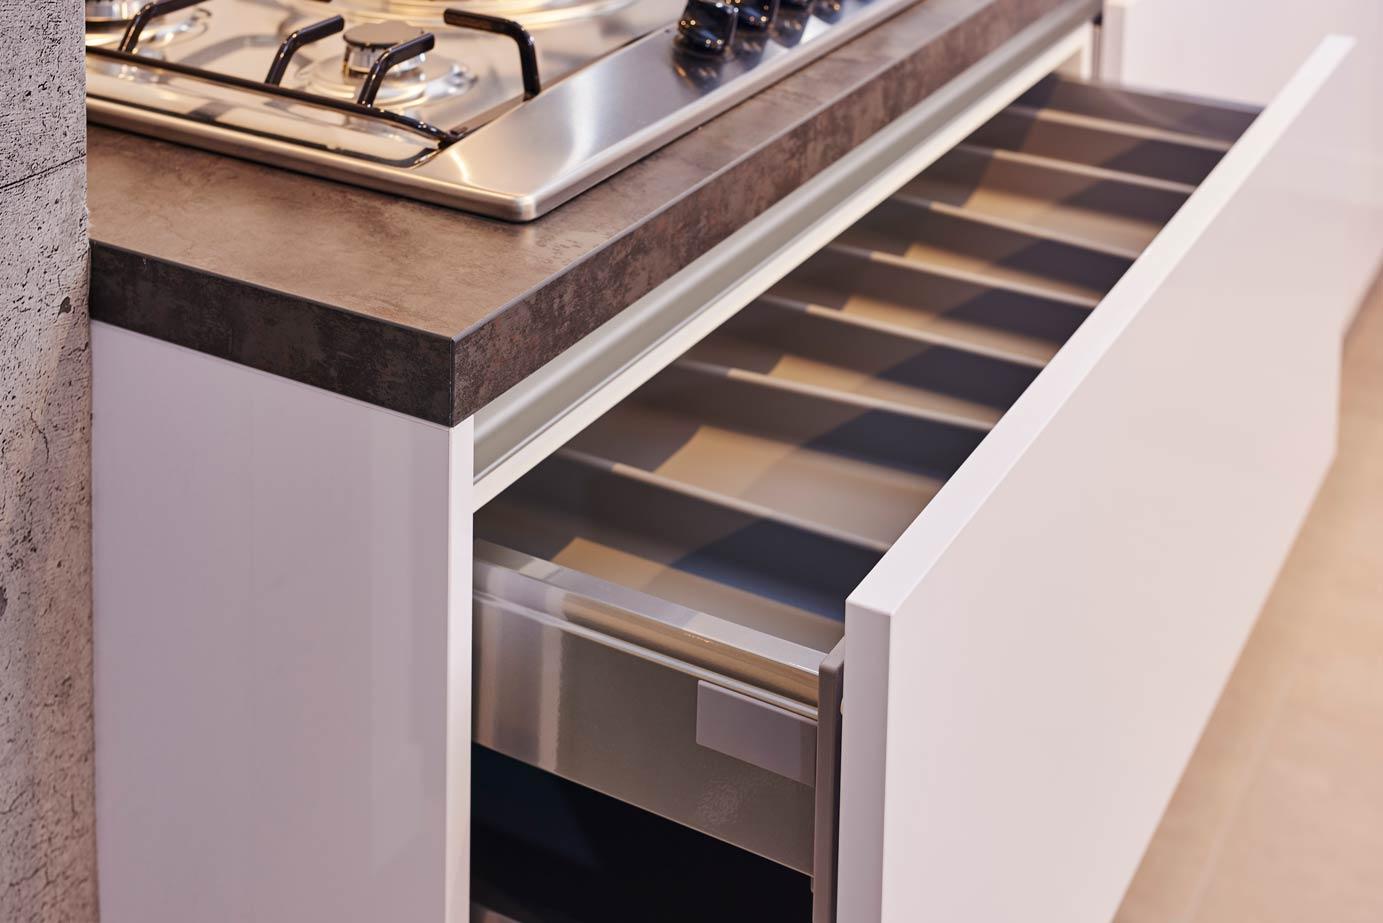 U Keuken Kopen : Goedkope keuken kopen véél keus elke stijl keur